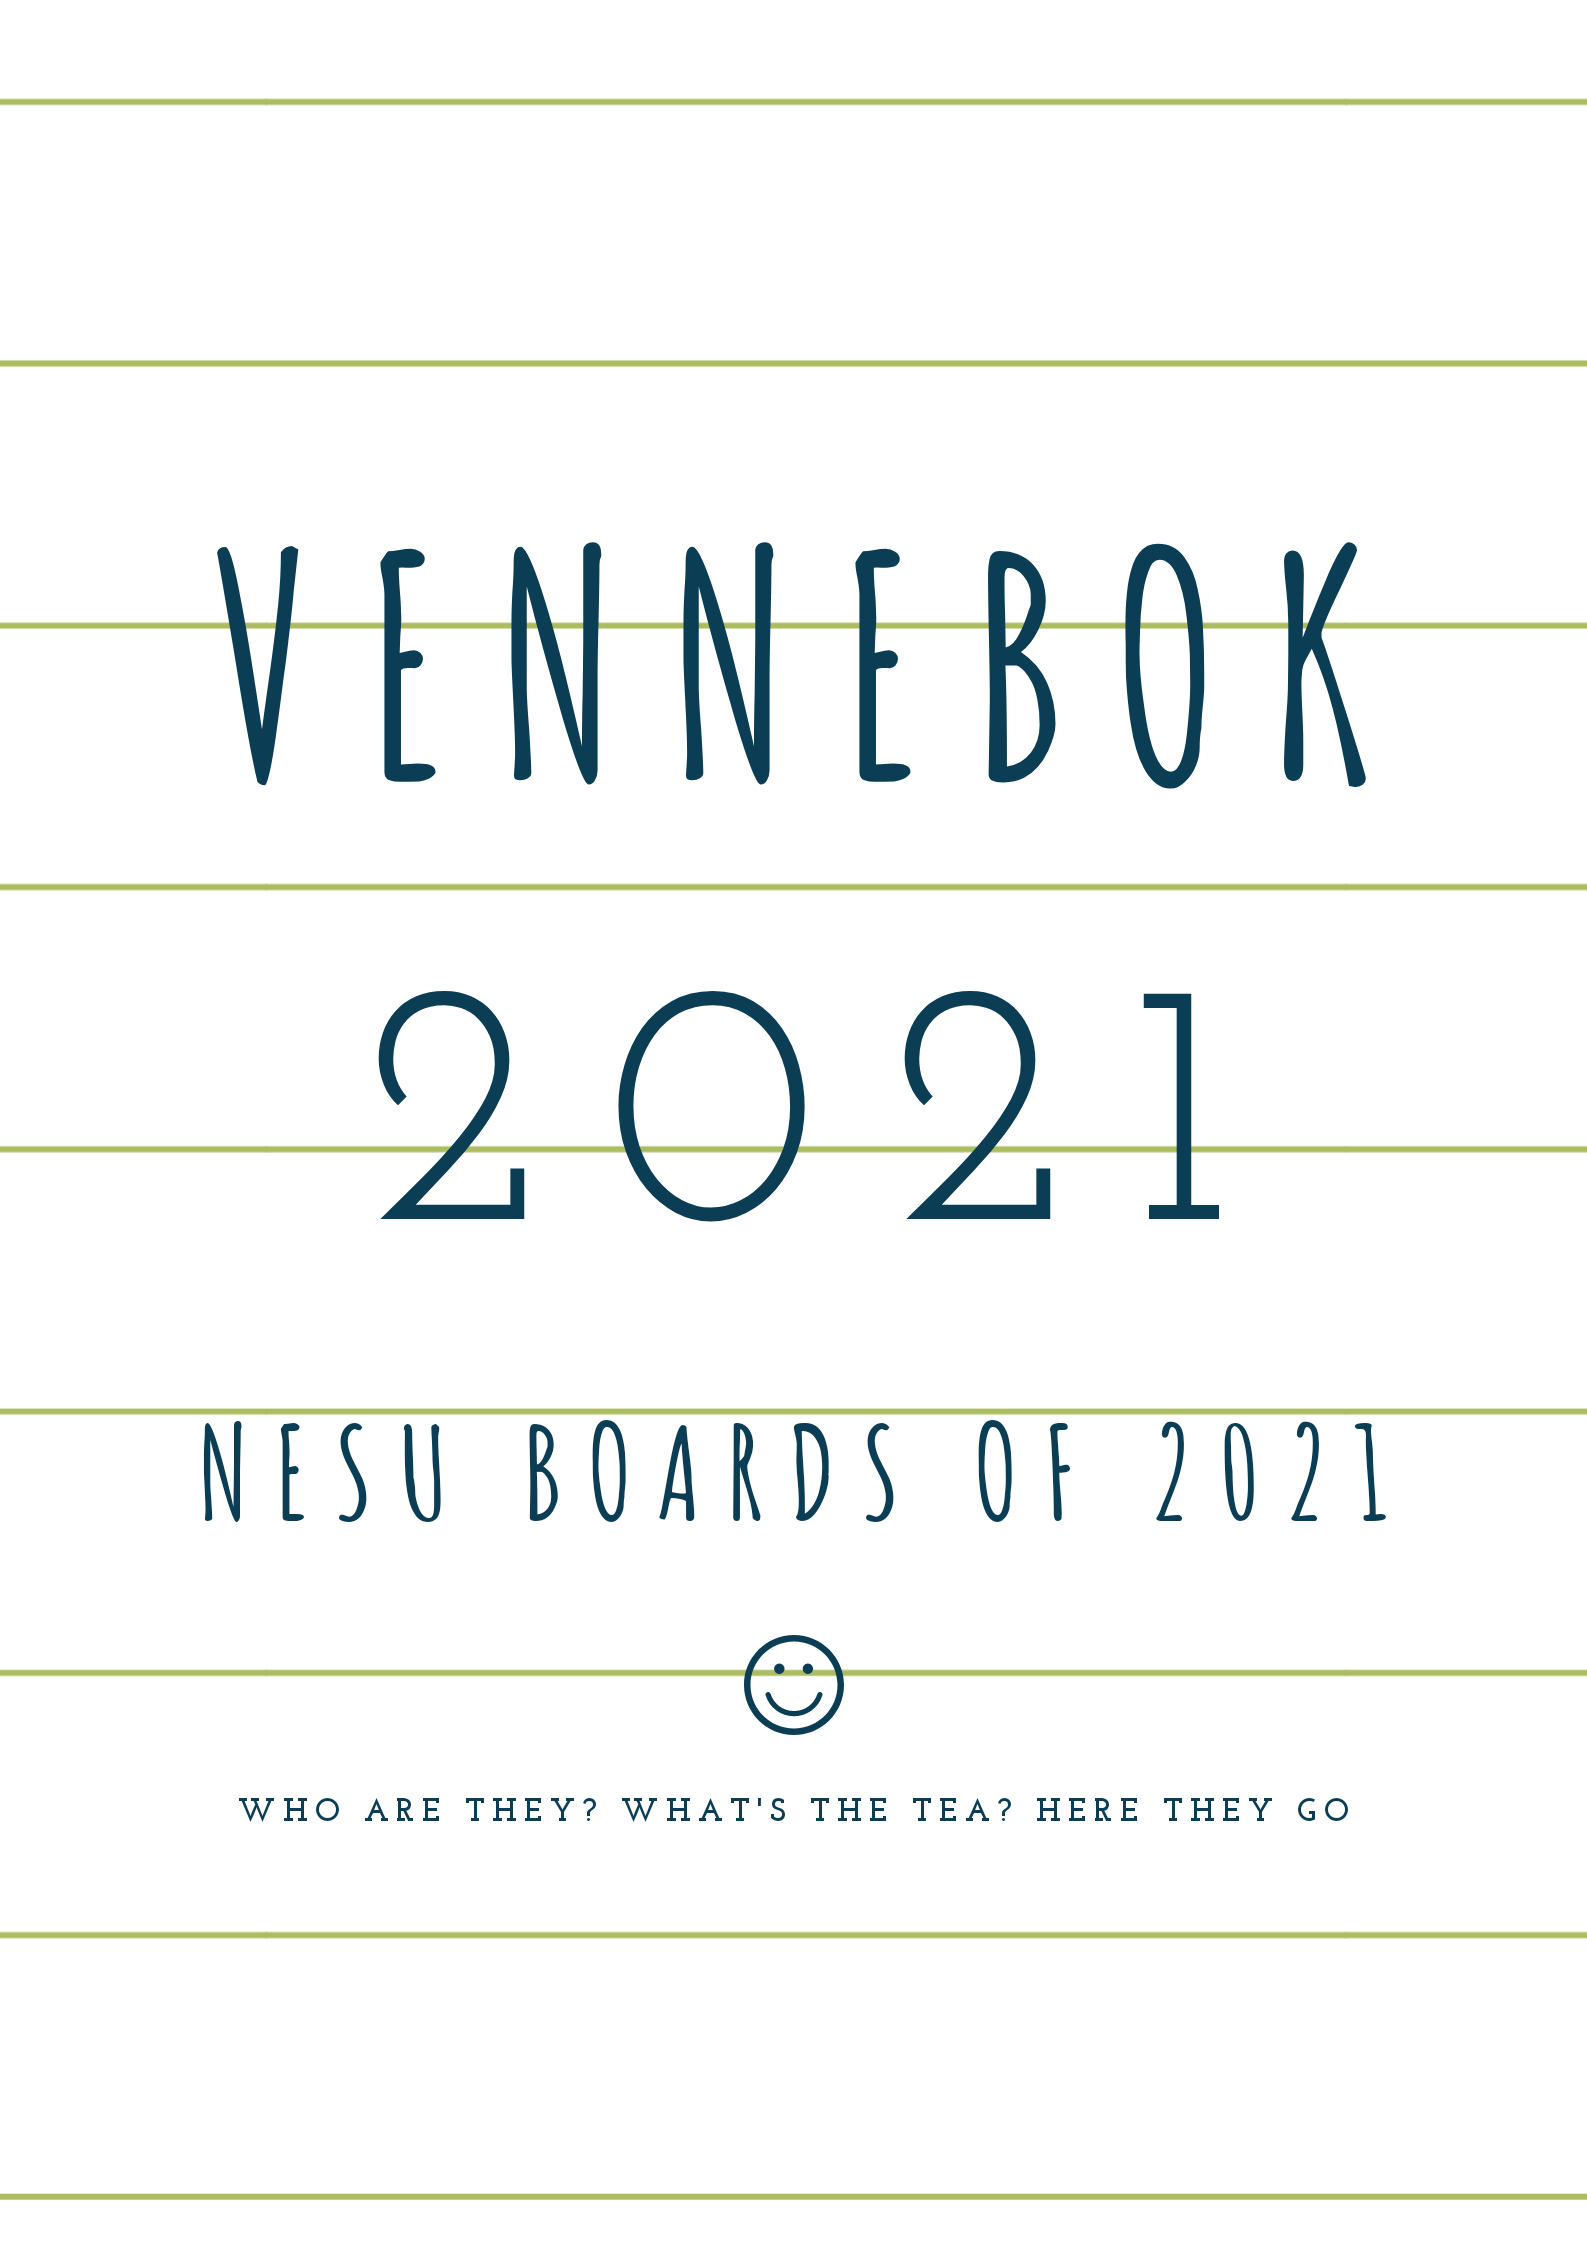 VENNEBOK, PART 1